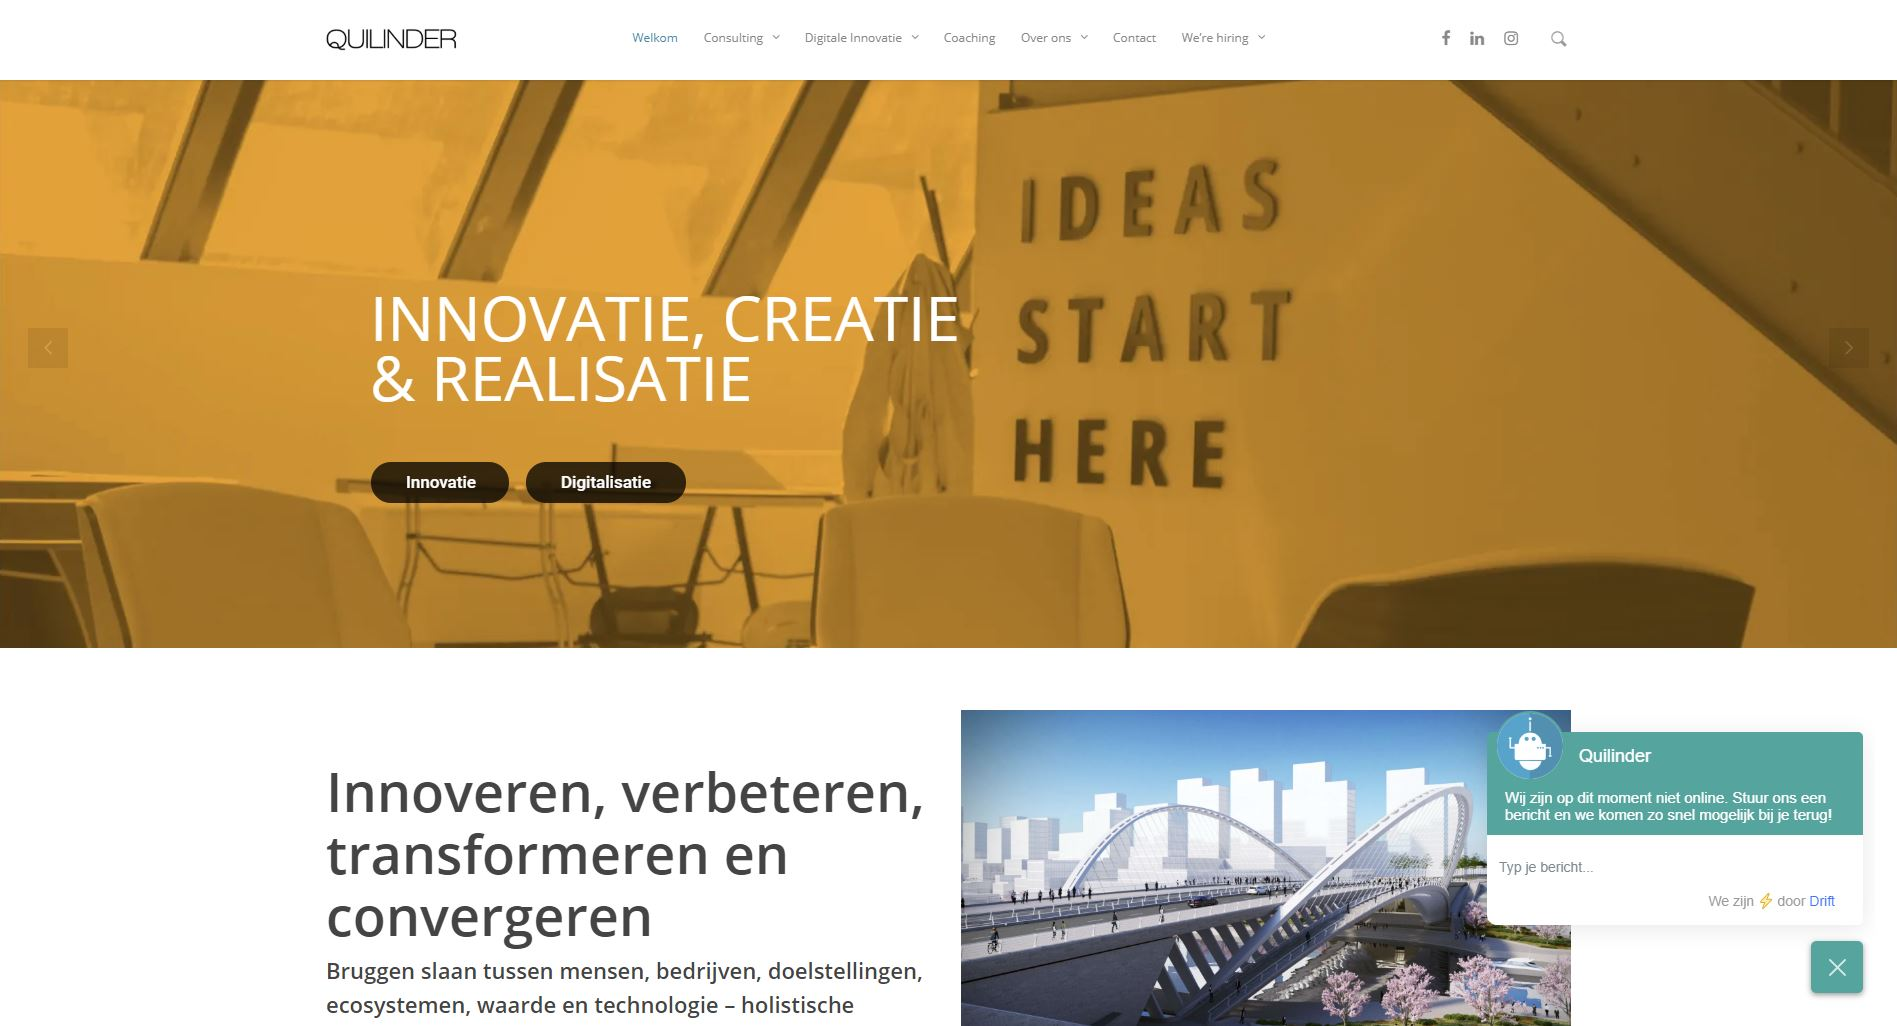 Quilinder website